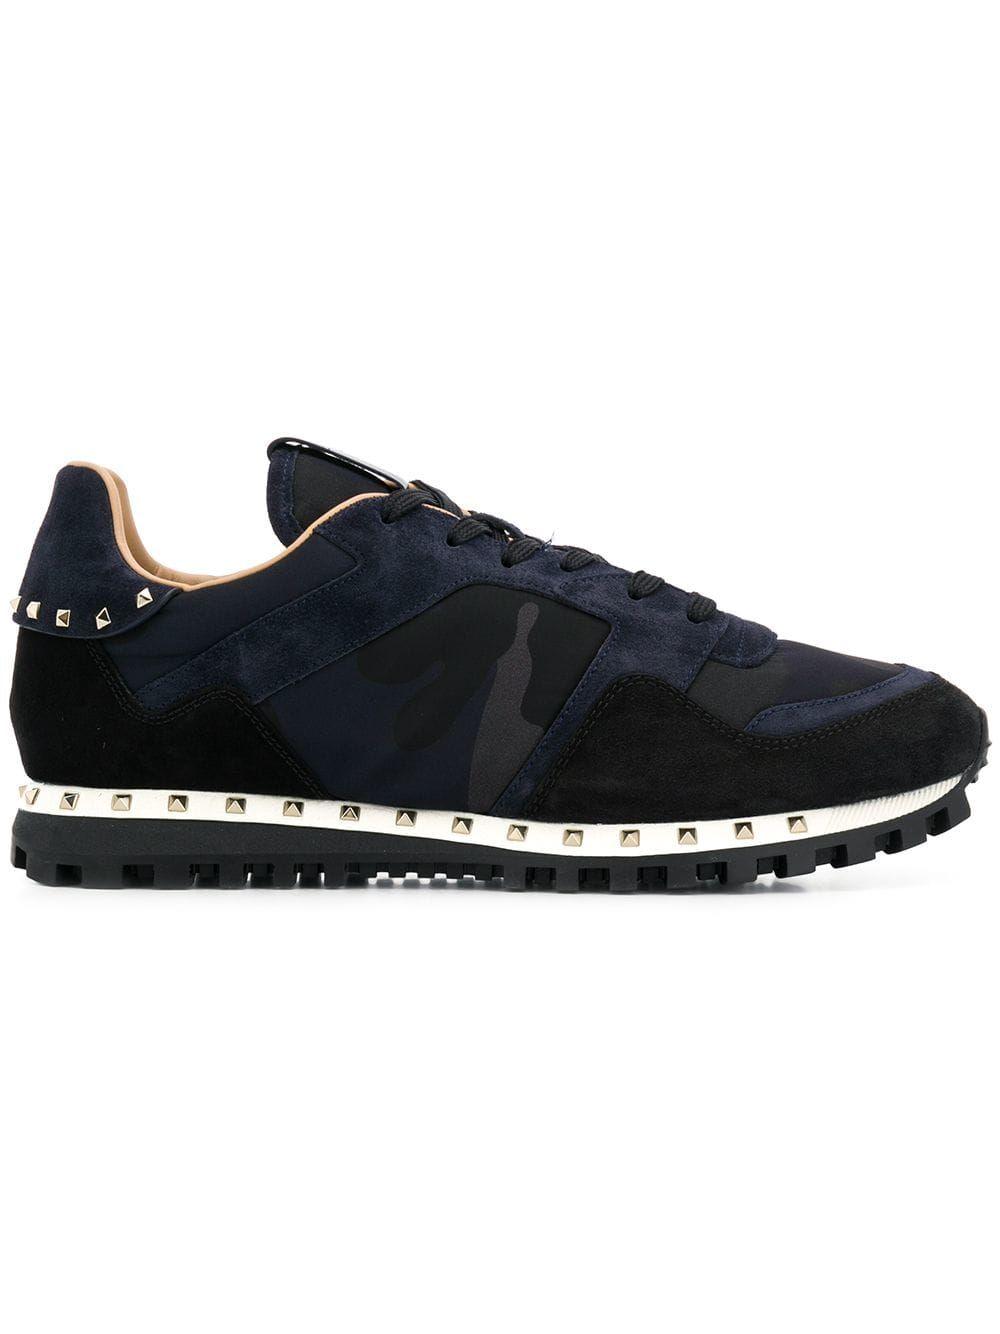 8ce217404d VALENTINO VALENTINO VALENTINO GARAVANI ROCKSTUD CAMOUFLAGE SNEAKERS - BLUE.   valentino  shoes